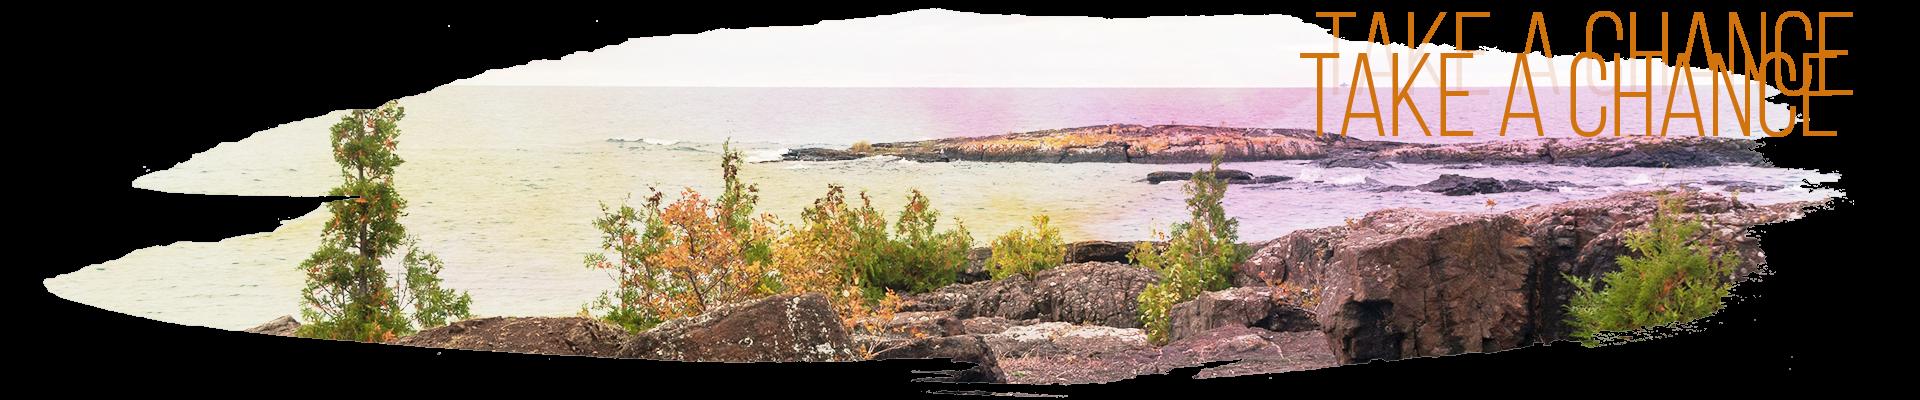 Black Rocks of Presque Isle Park - Take a chance